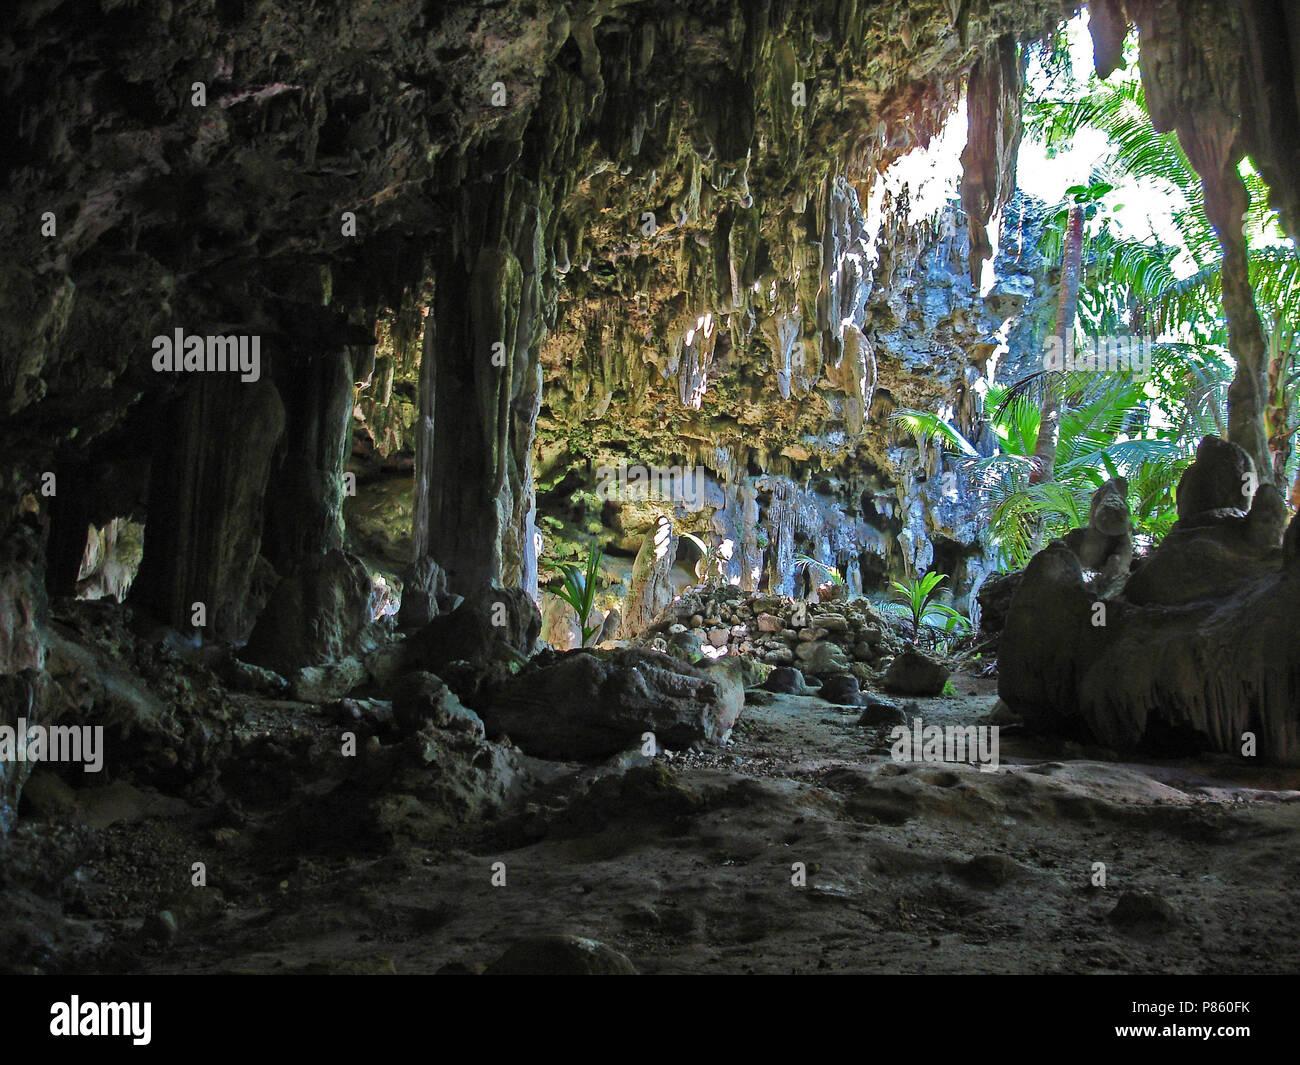 Atiu Caves Polynesië, Atiu Caves Polynesie - Stock Image